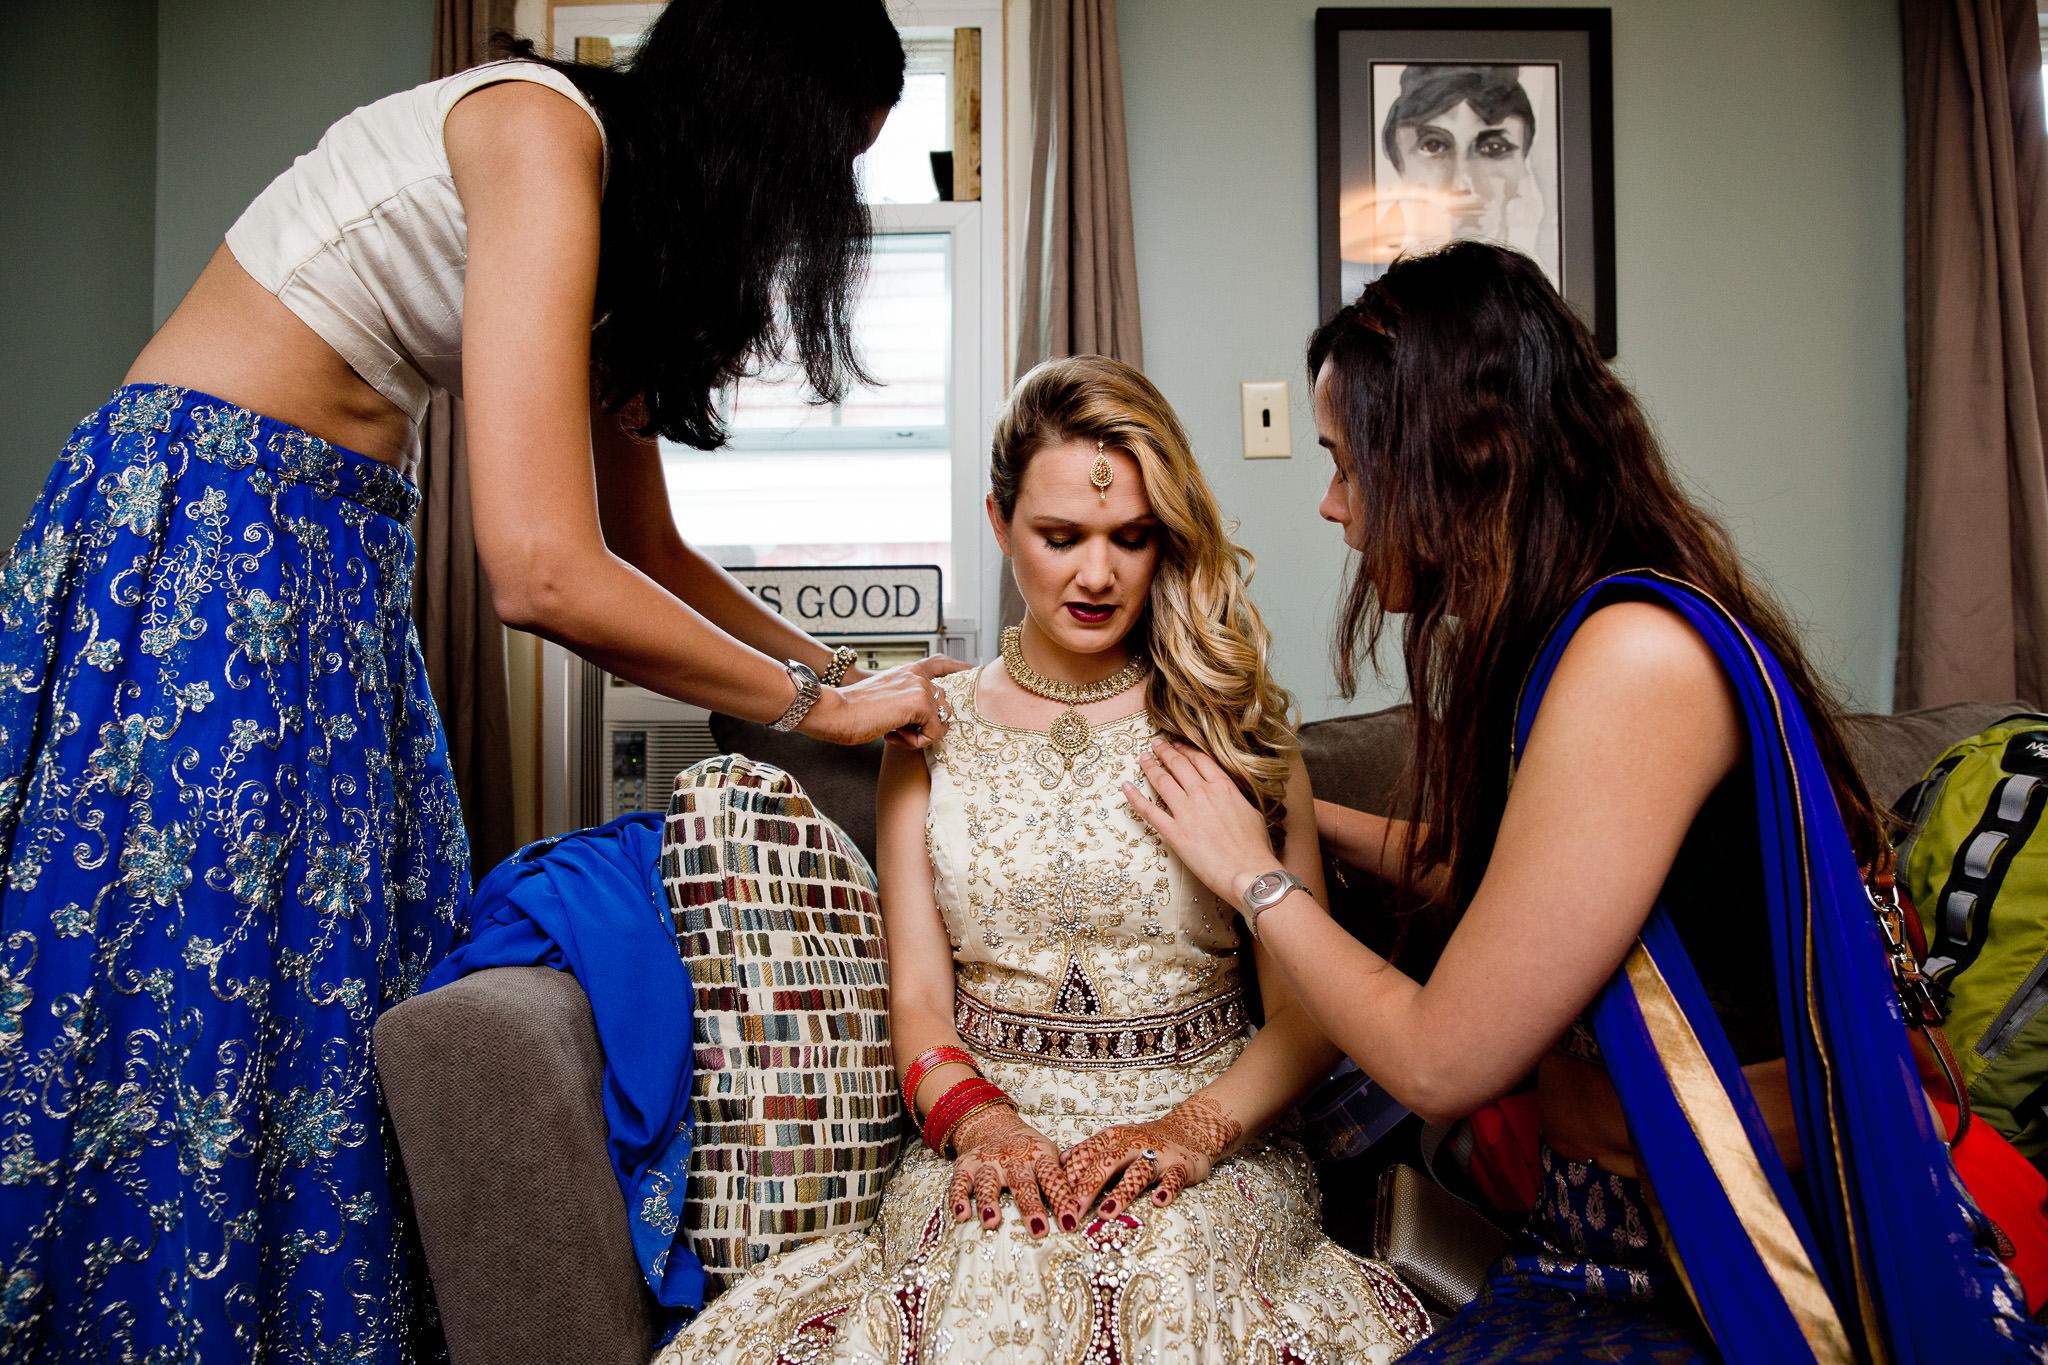 014_Canada-documentary-wedding-photograp